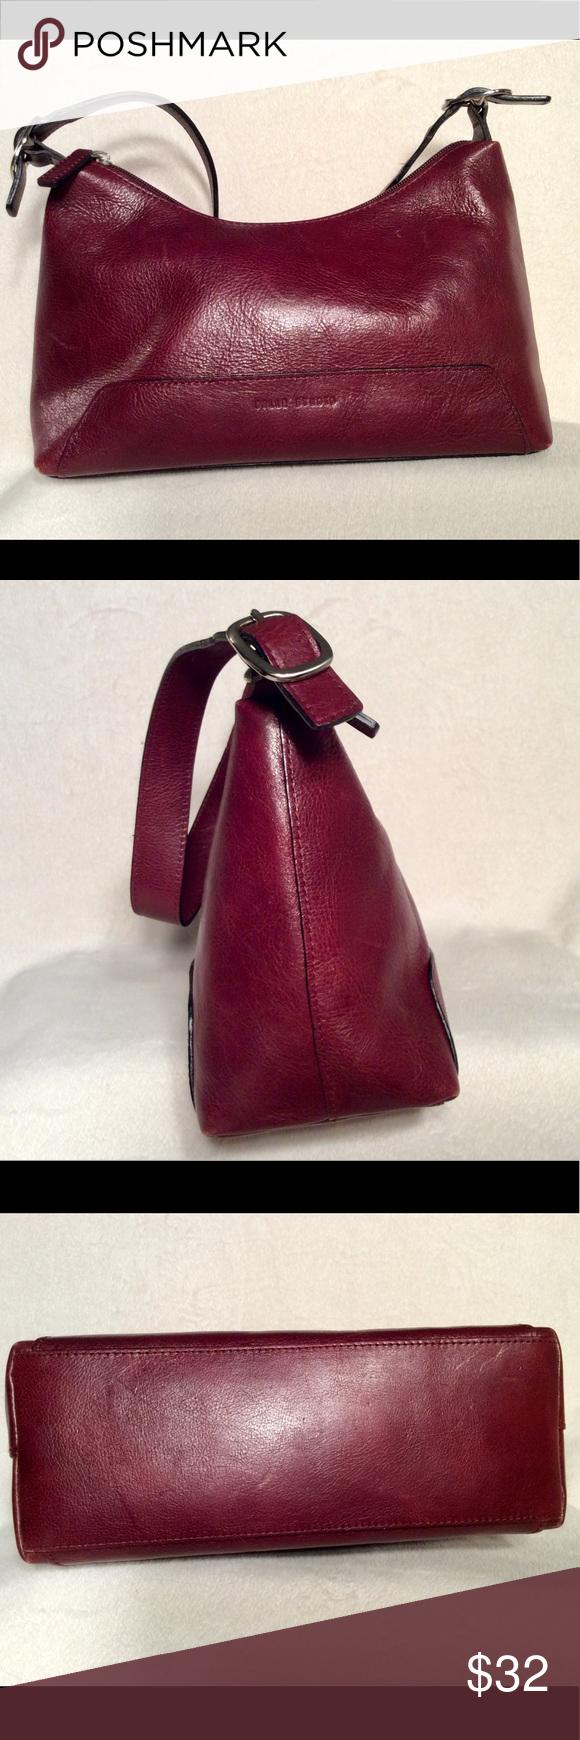 WILSON'S LEATHER PELLE STUDIO Leather shoulder bag EUC